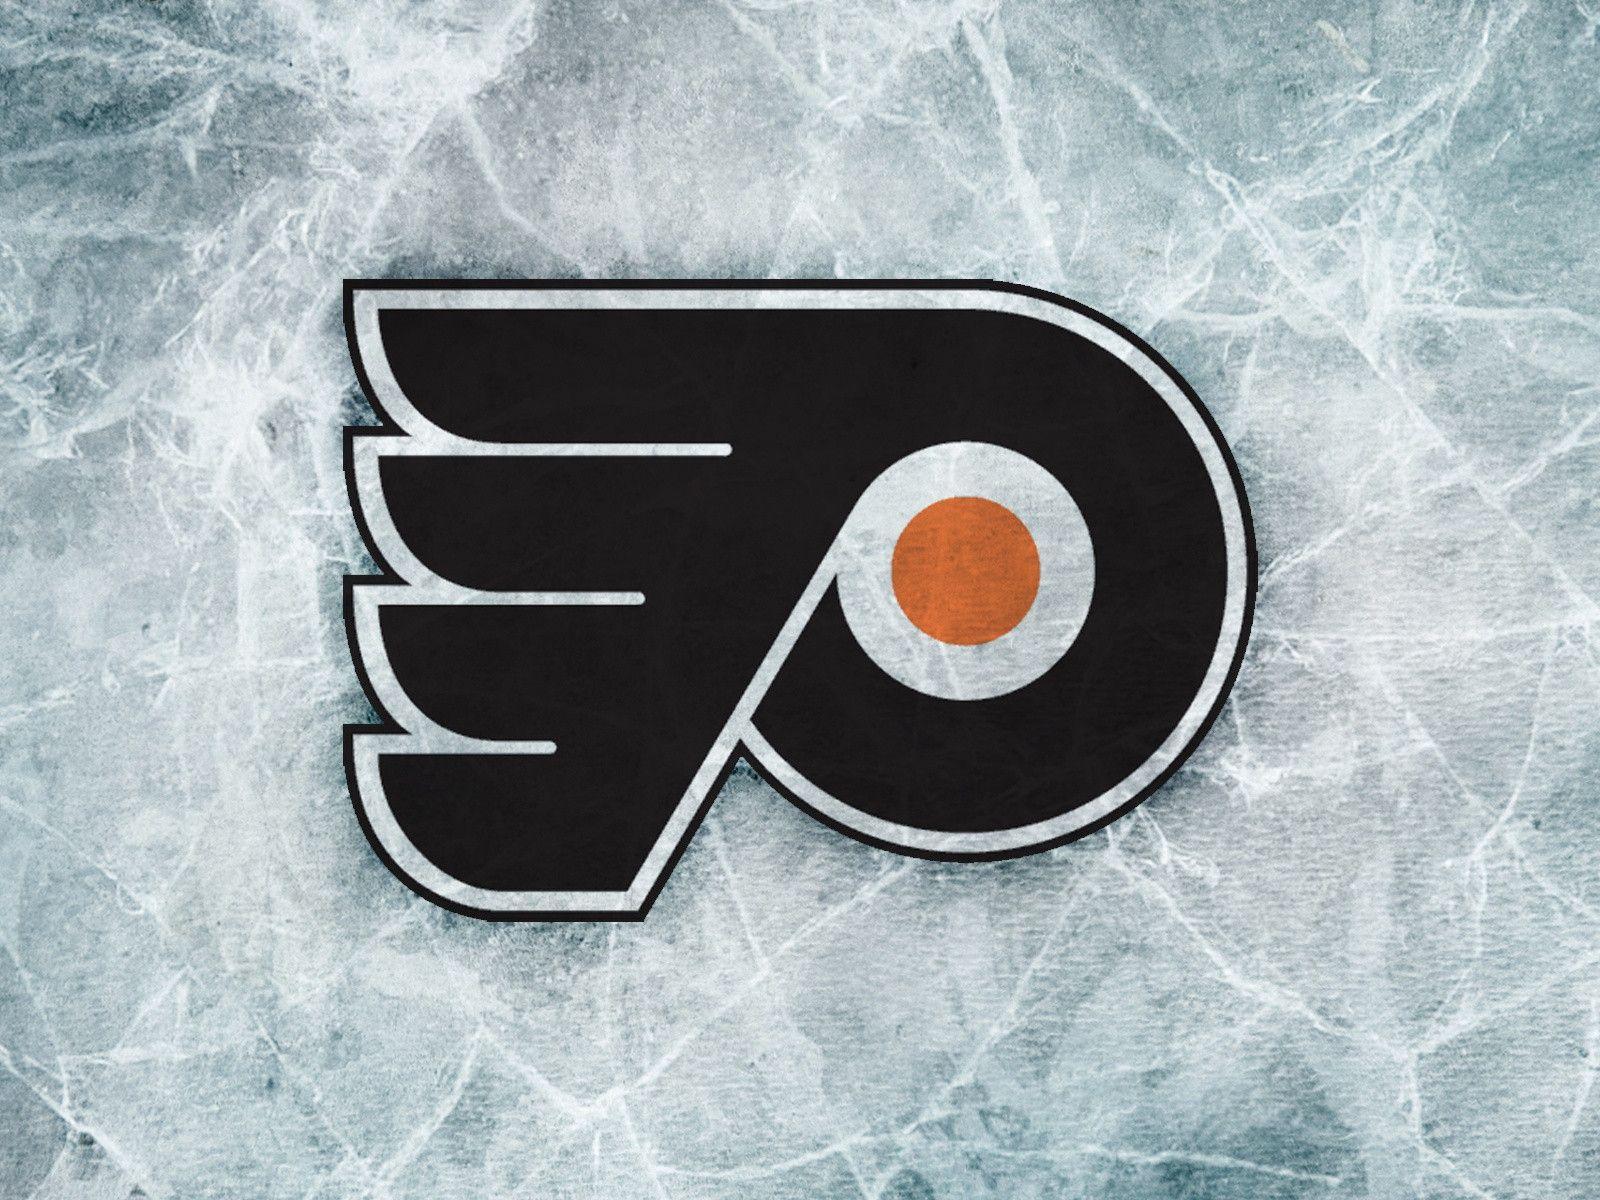 Philadelphia Flyers Wallpaper 1600x1200